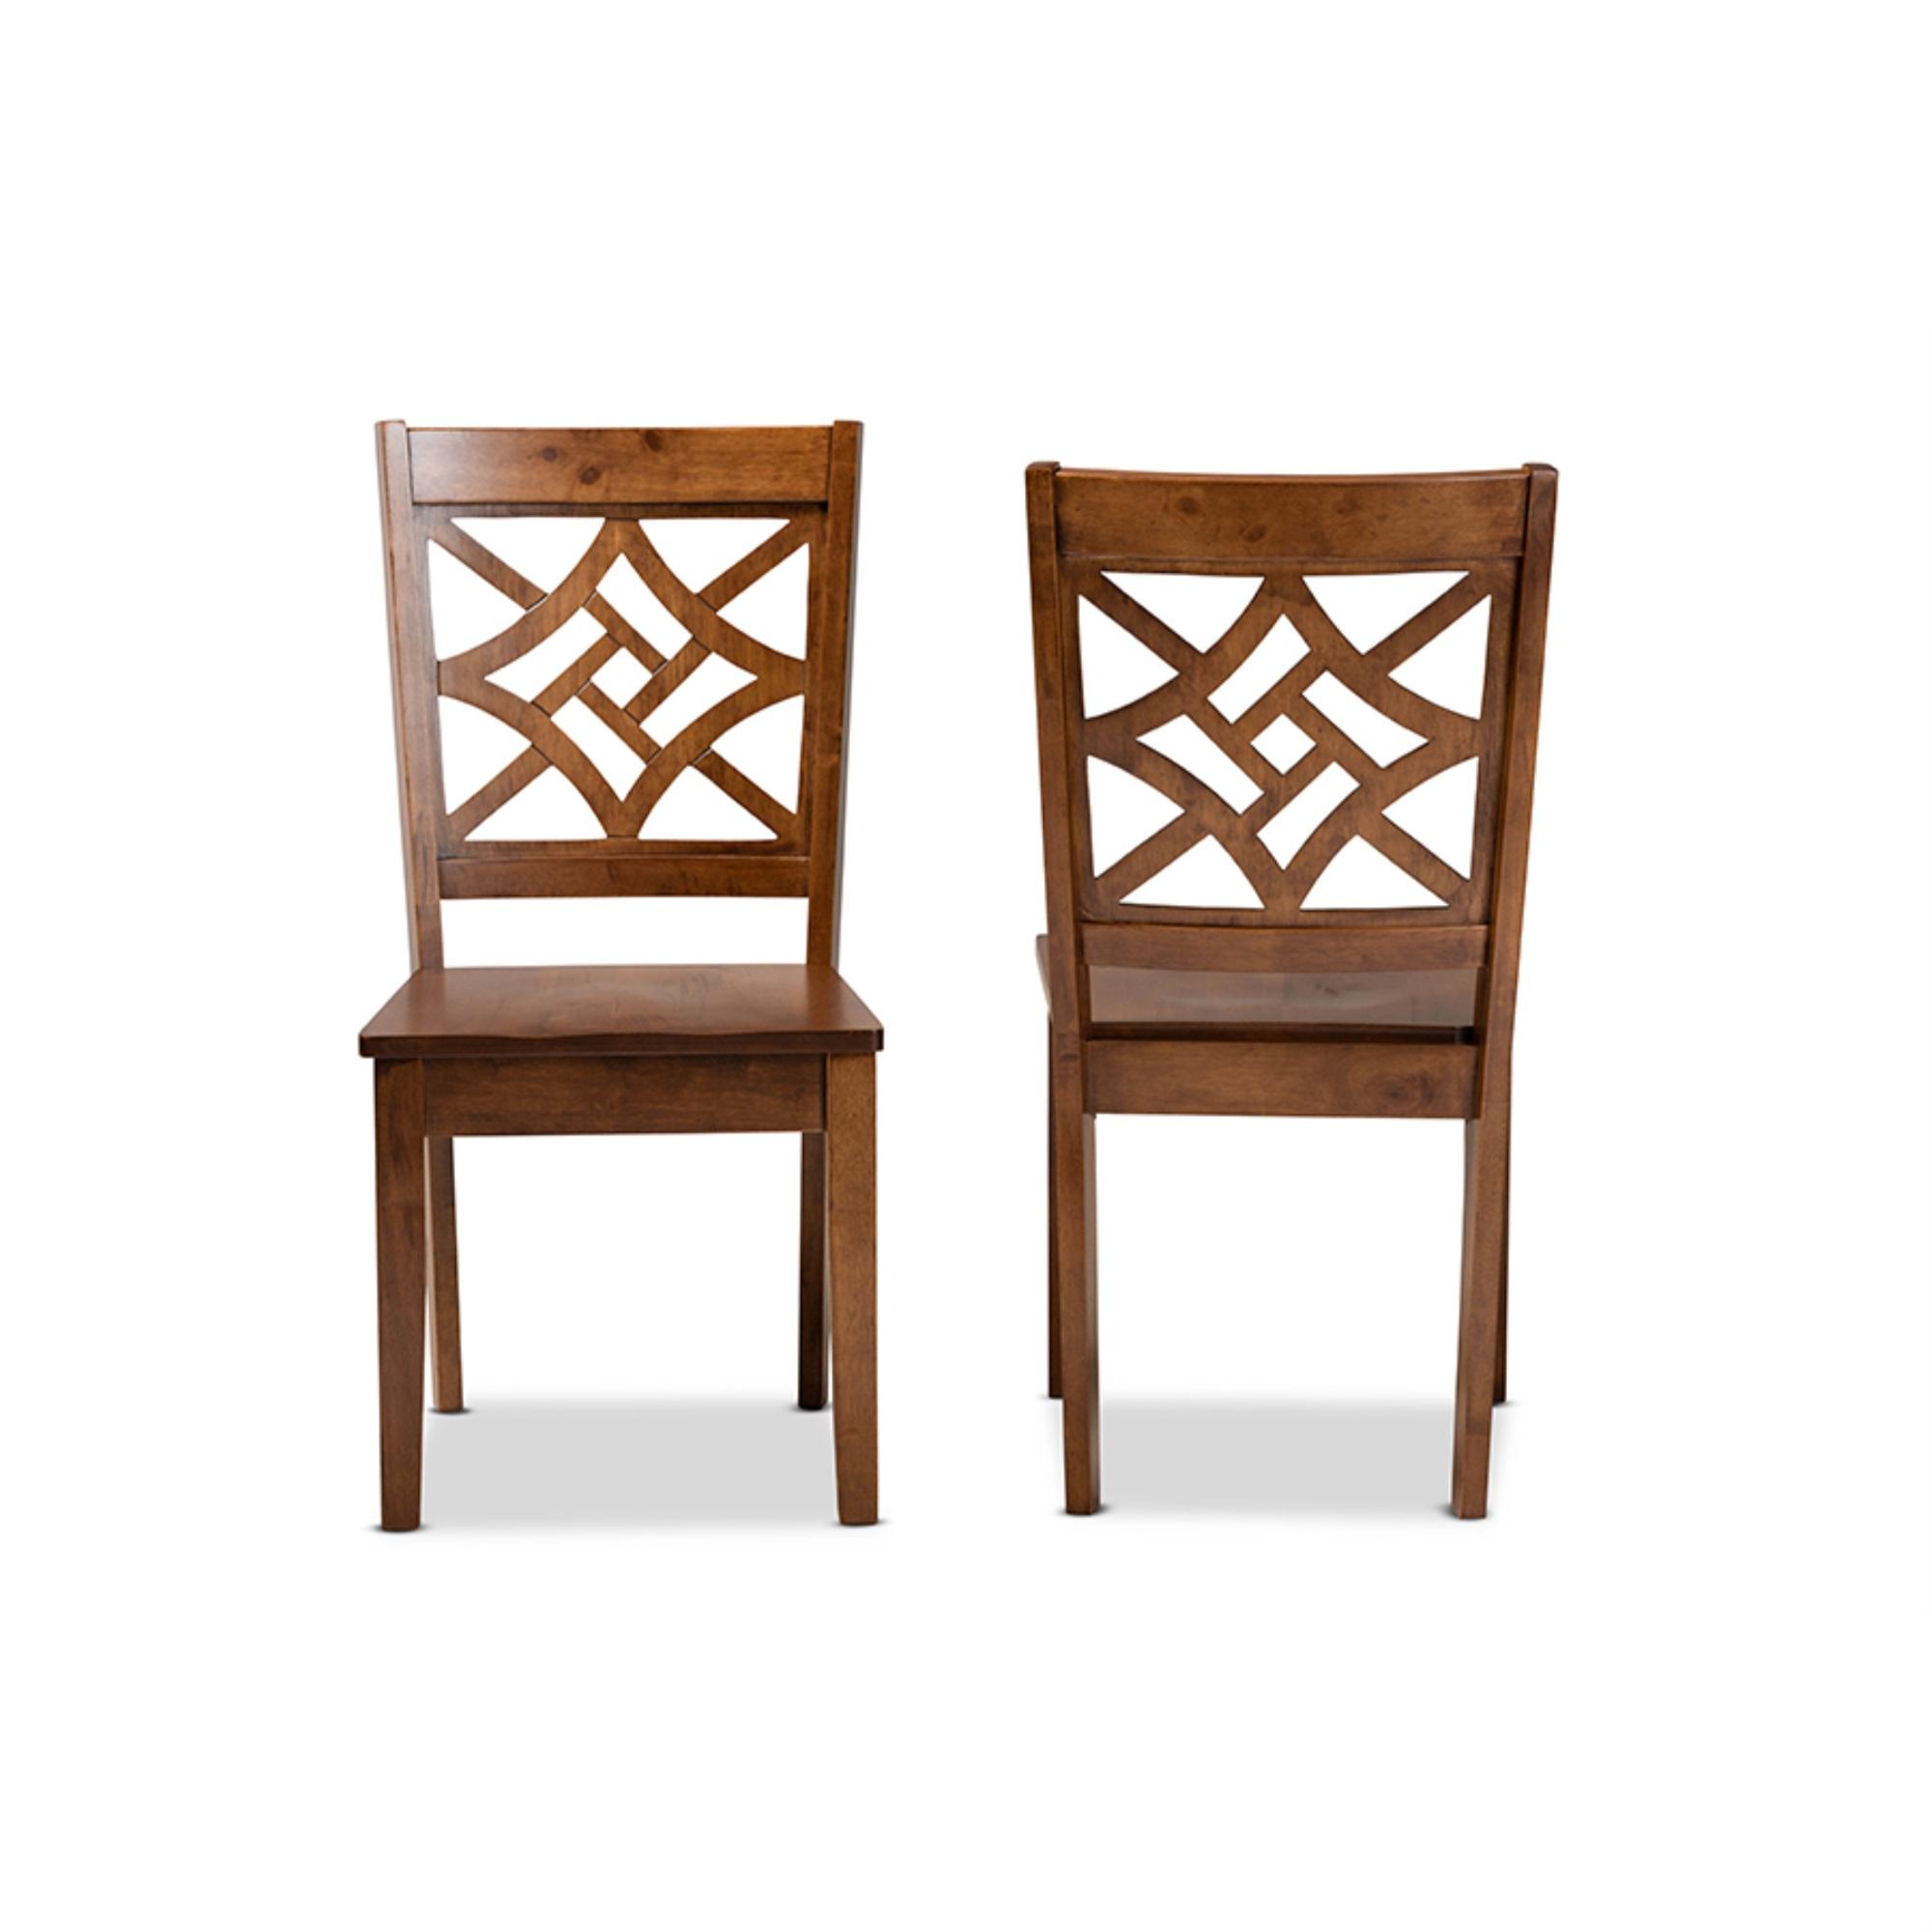 Baxton Studio Didier Modern Contemporary Office Chair Walnut White For Sale Online Ebay